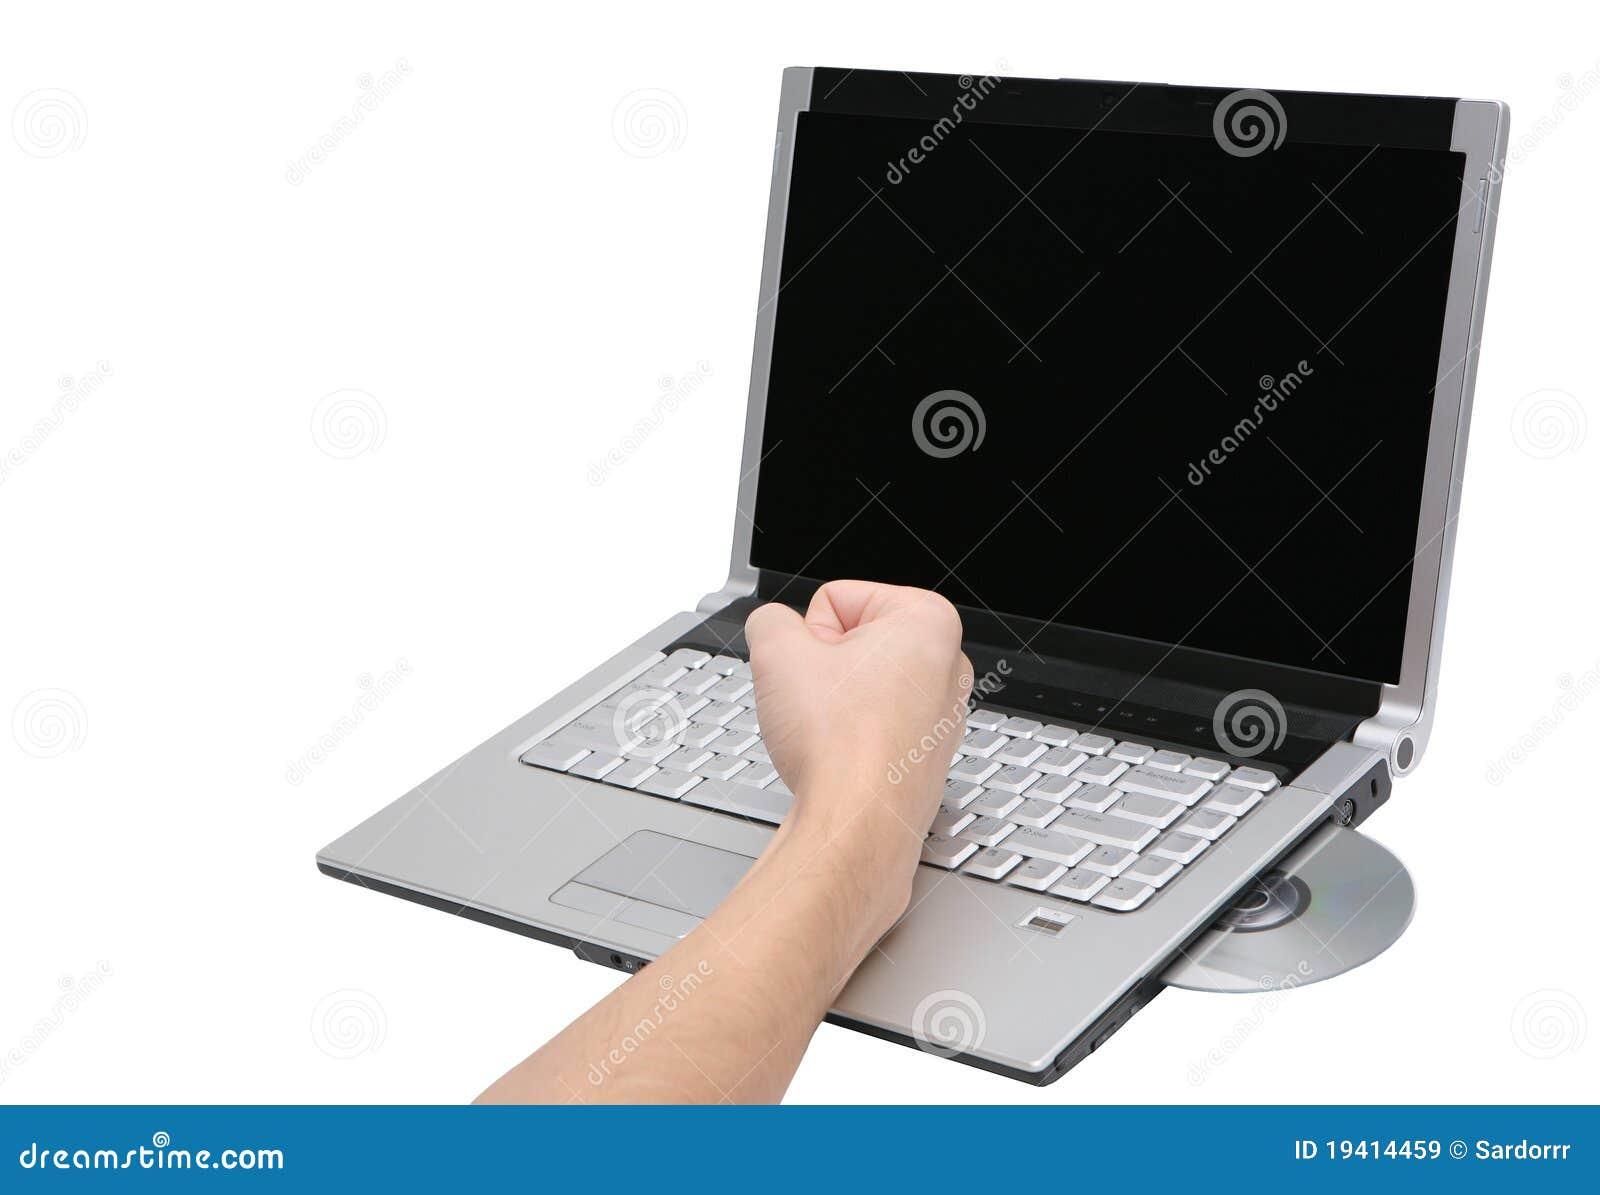 Broken Laptop Computer Royalty Free Stock Images - Image: 19414459